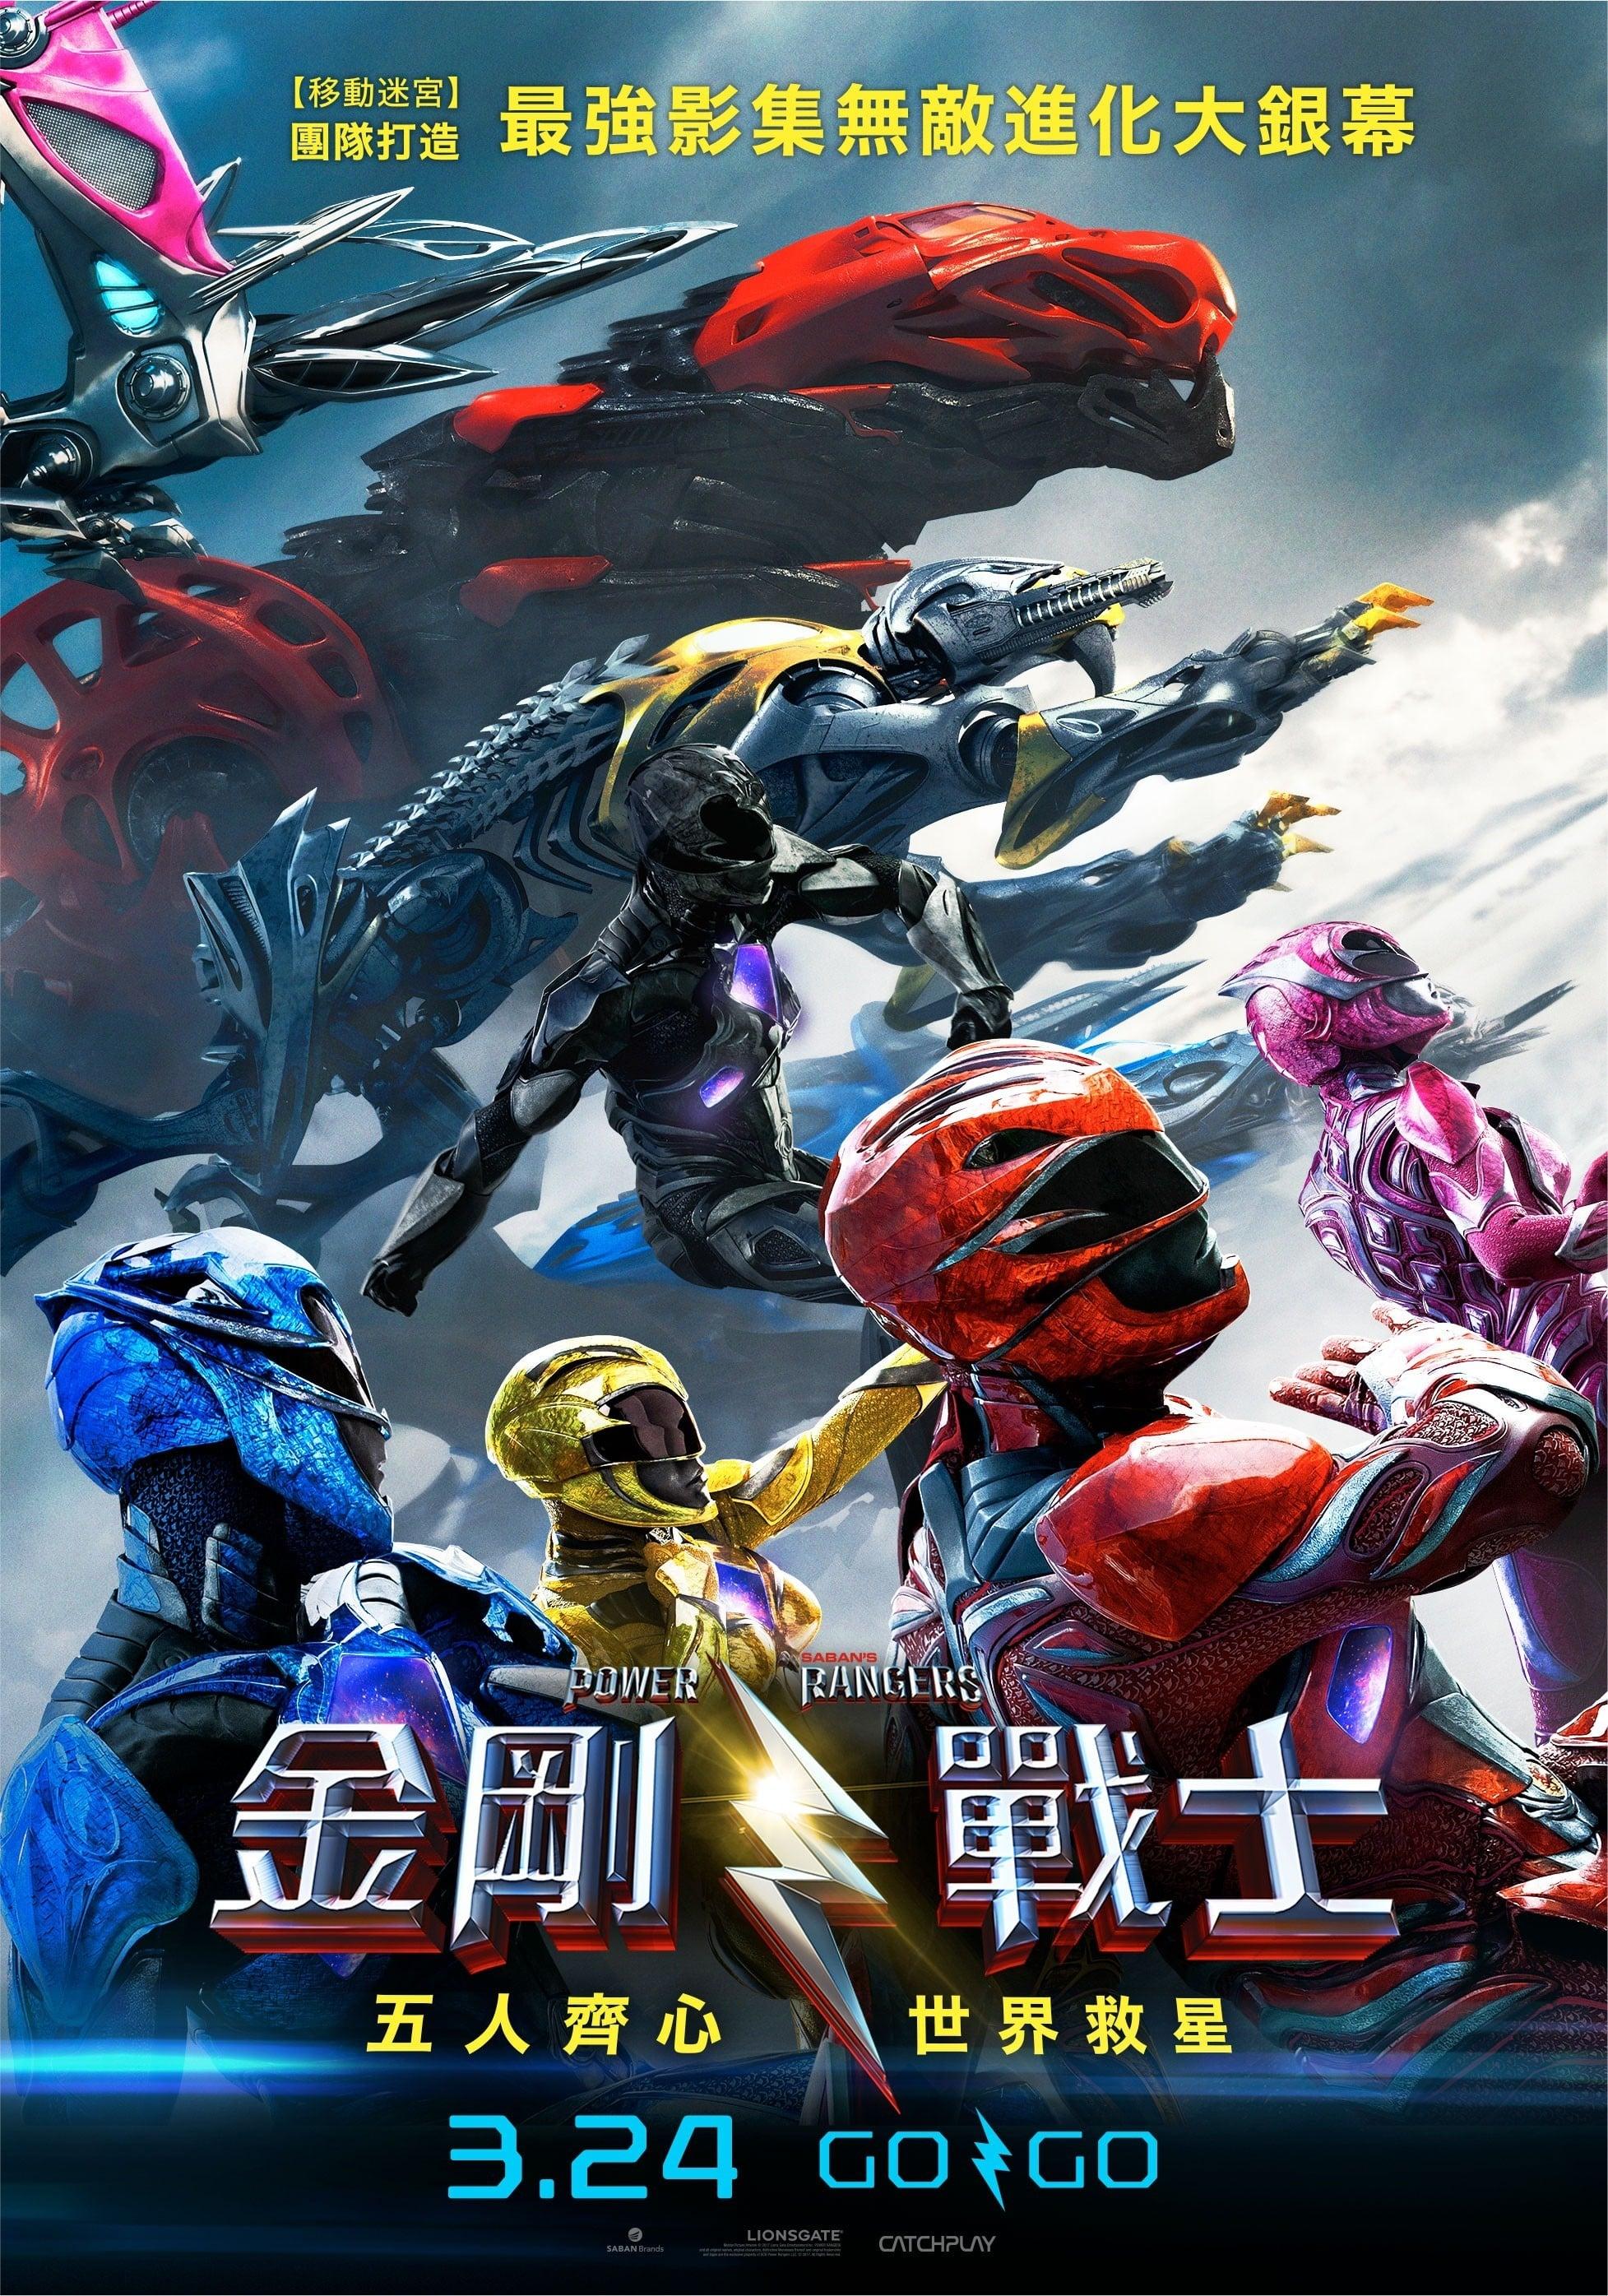 Power Rangers Movie Stream